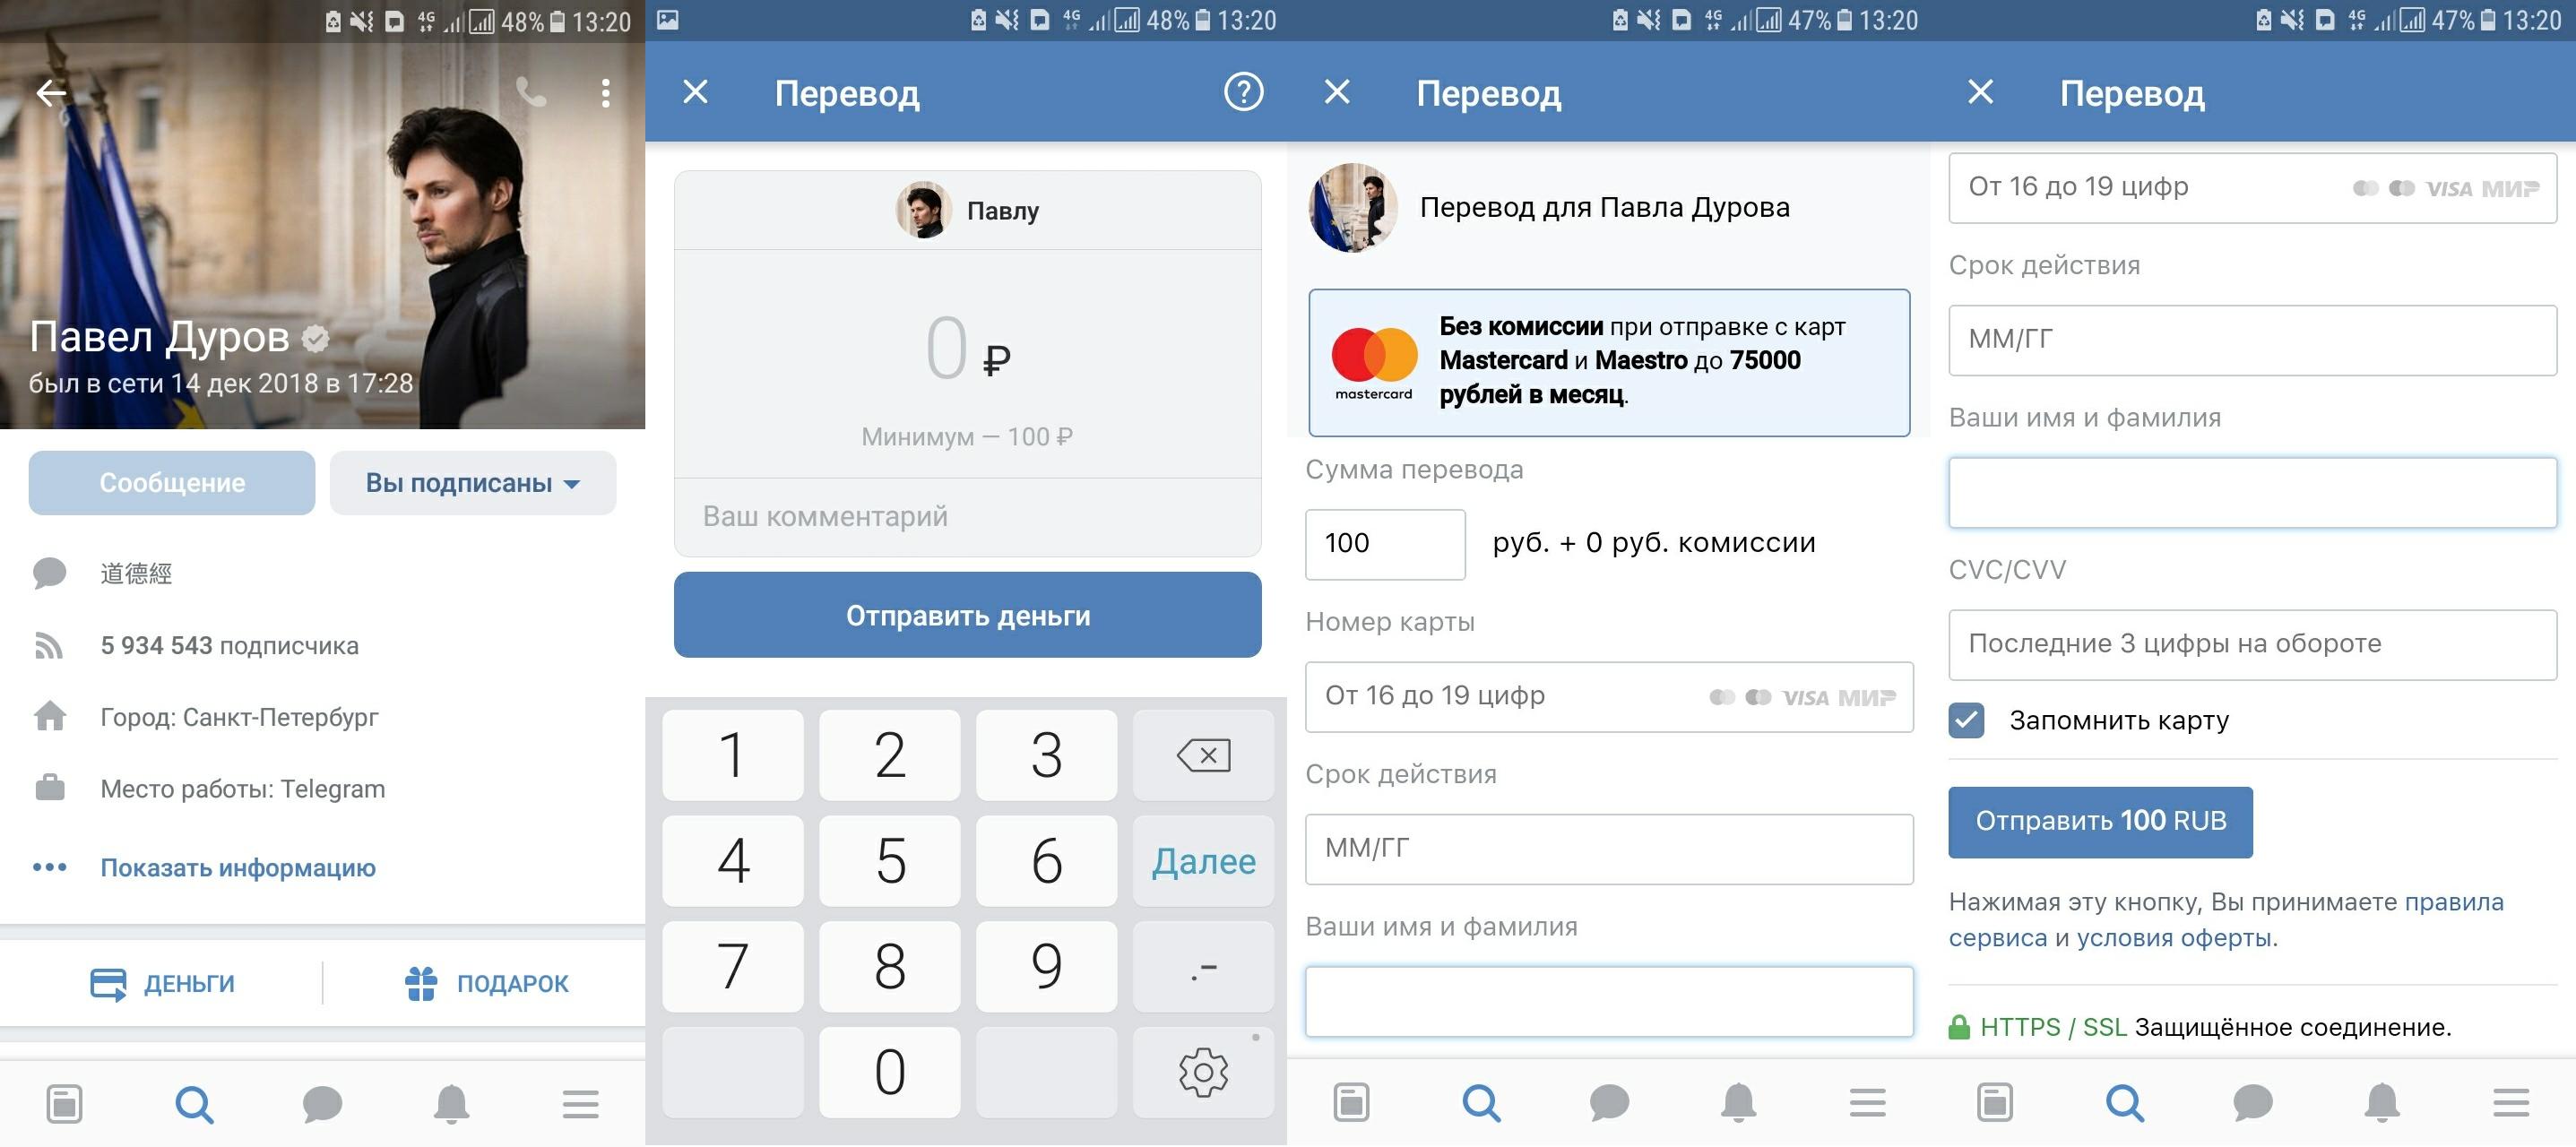 pevesti-dengi-vkontakte-cherez-telefon